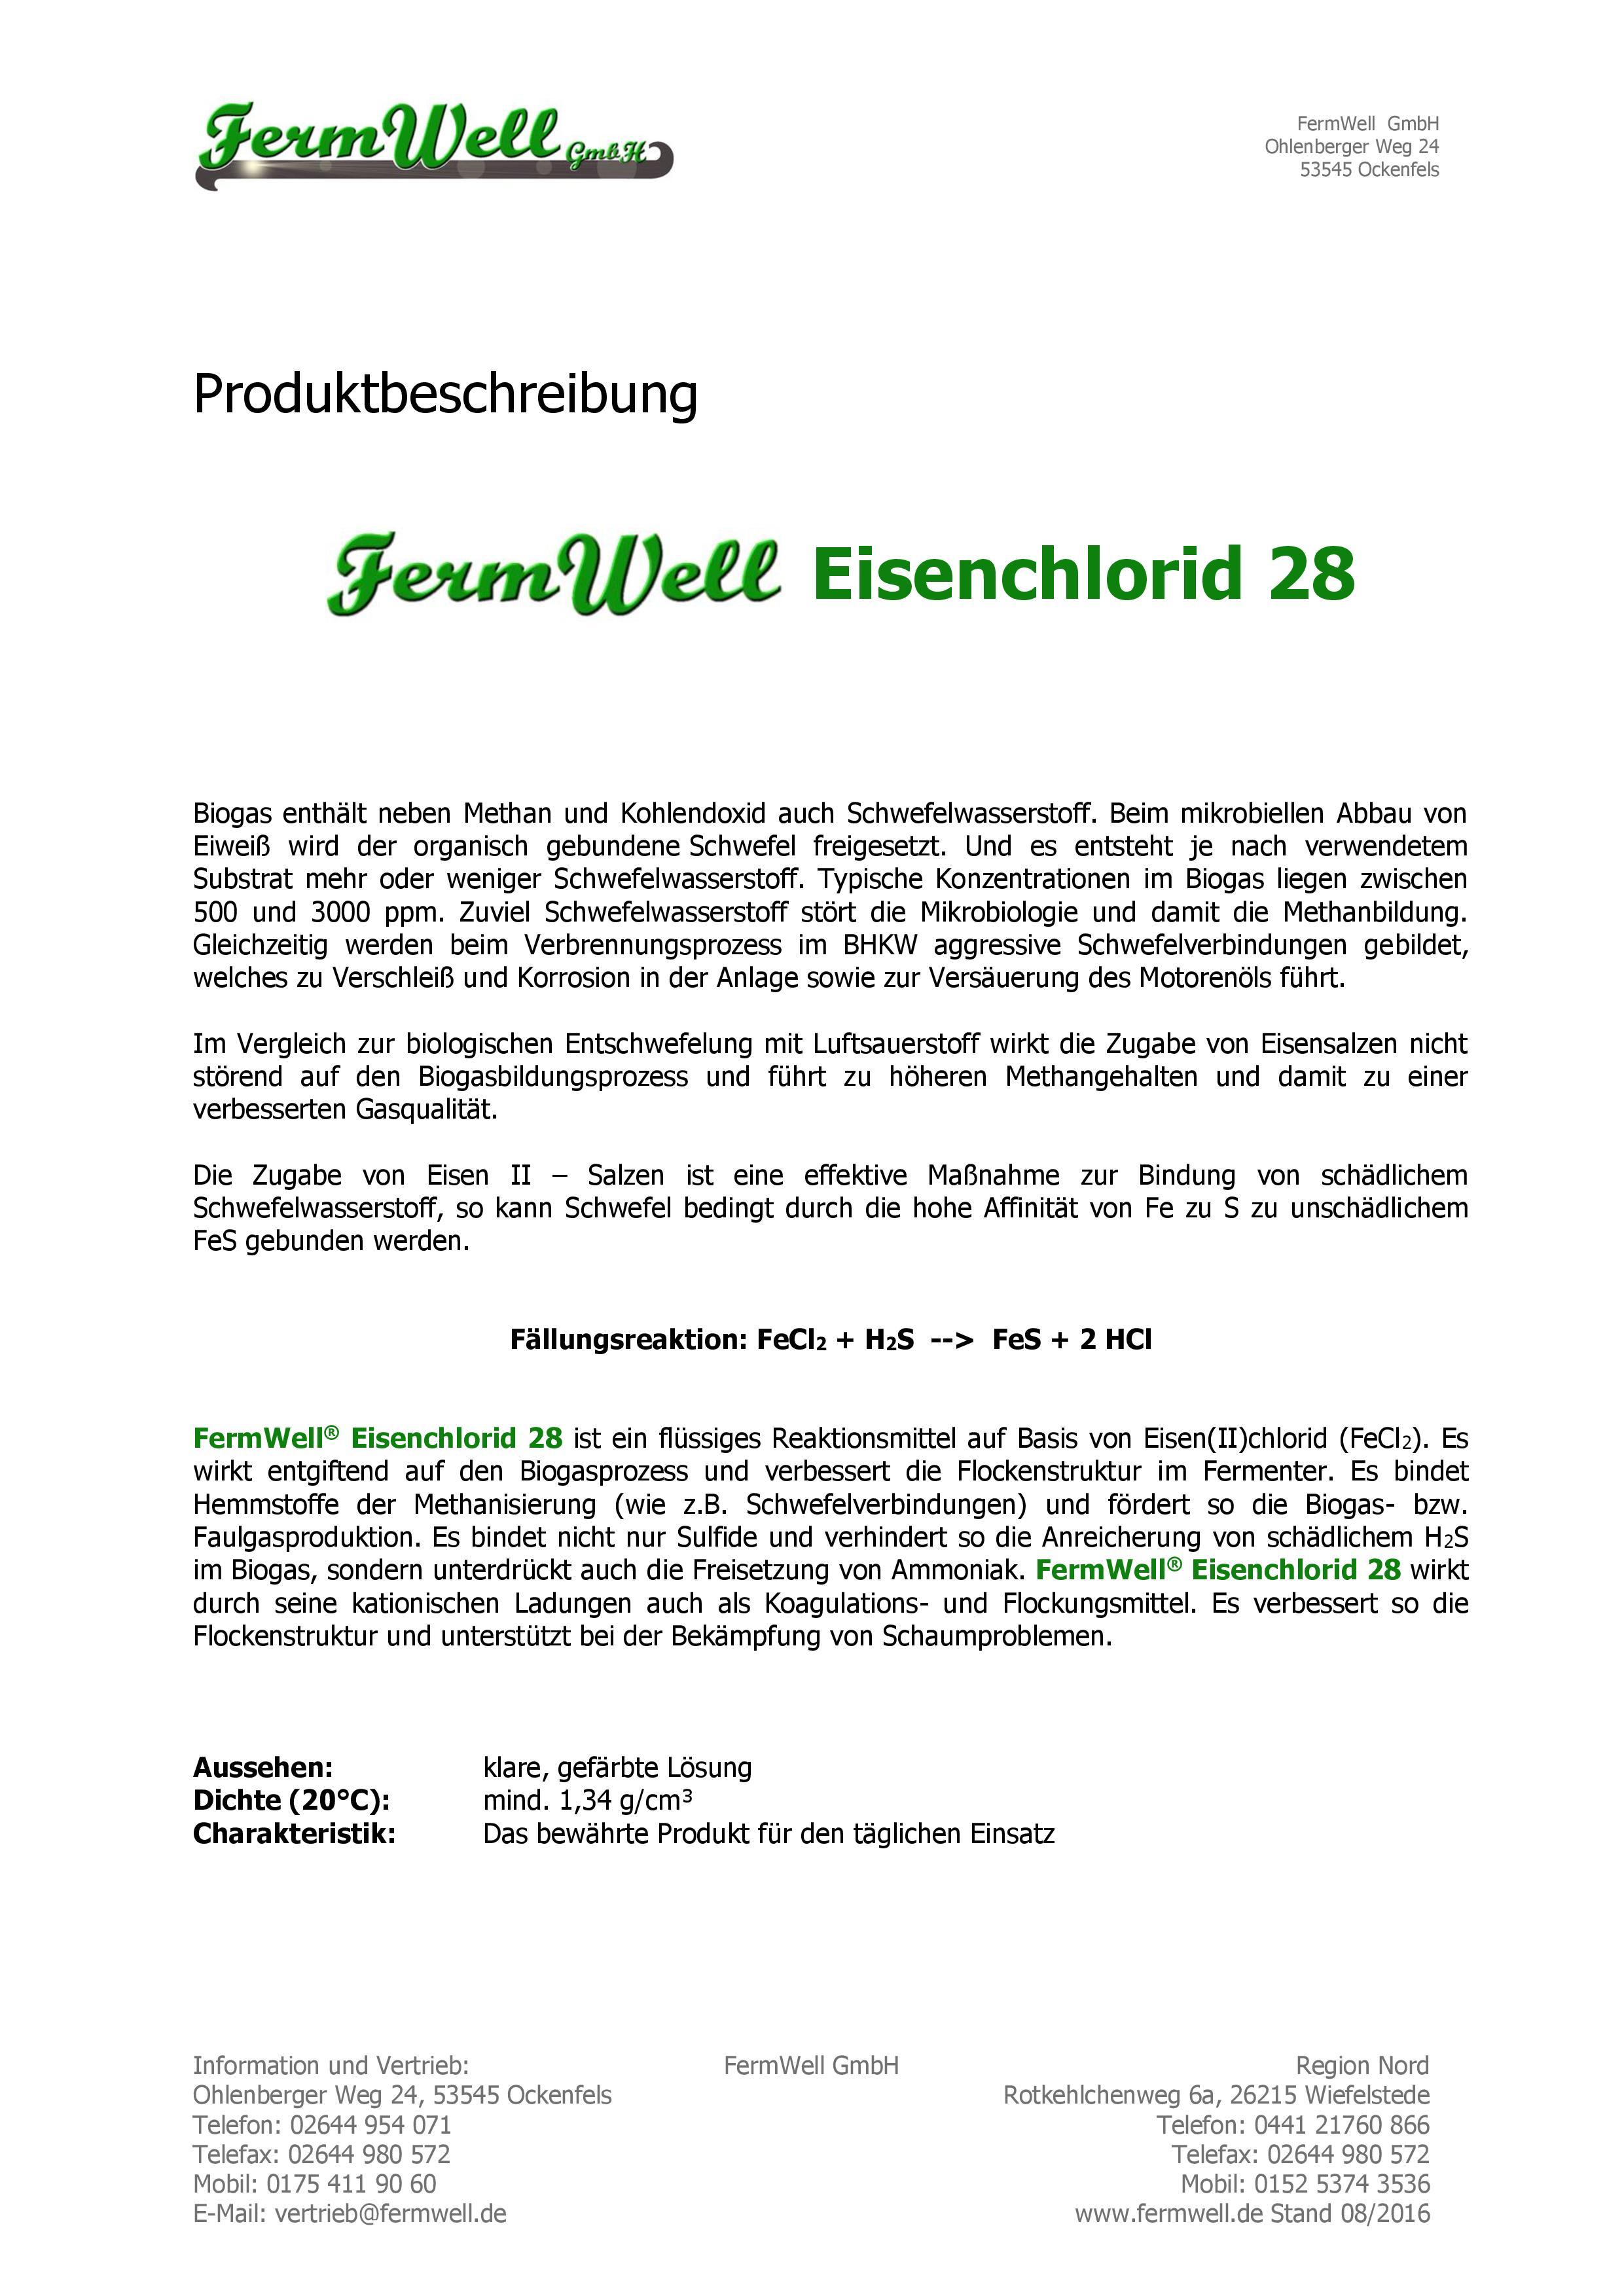 FWG_Eisenchlorid_28_Produktbeschreib_160